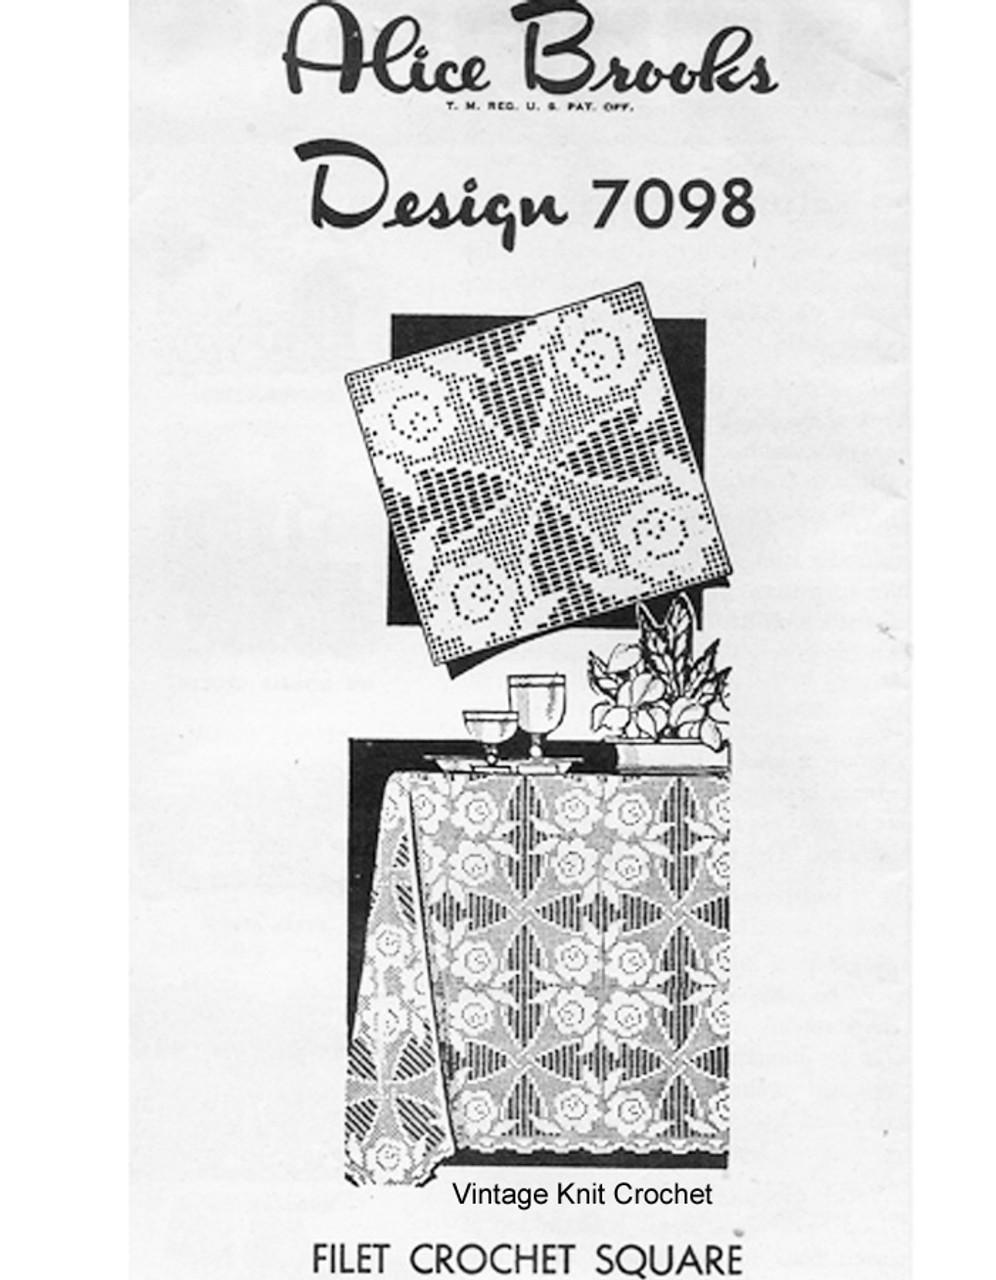 Rose Filet Crochet Square Tablecloth Pattern, Alice Brooks 7098